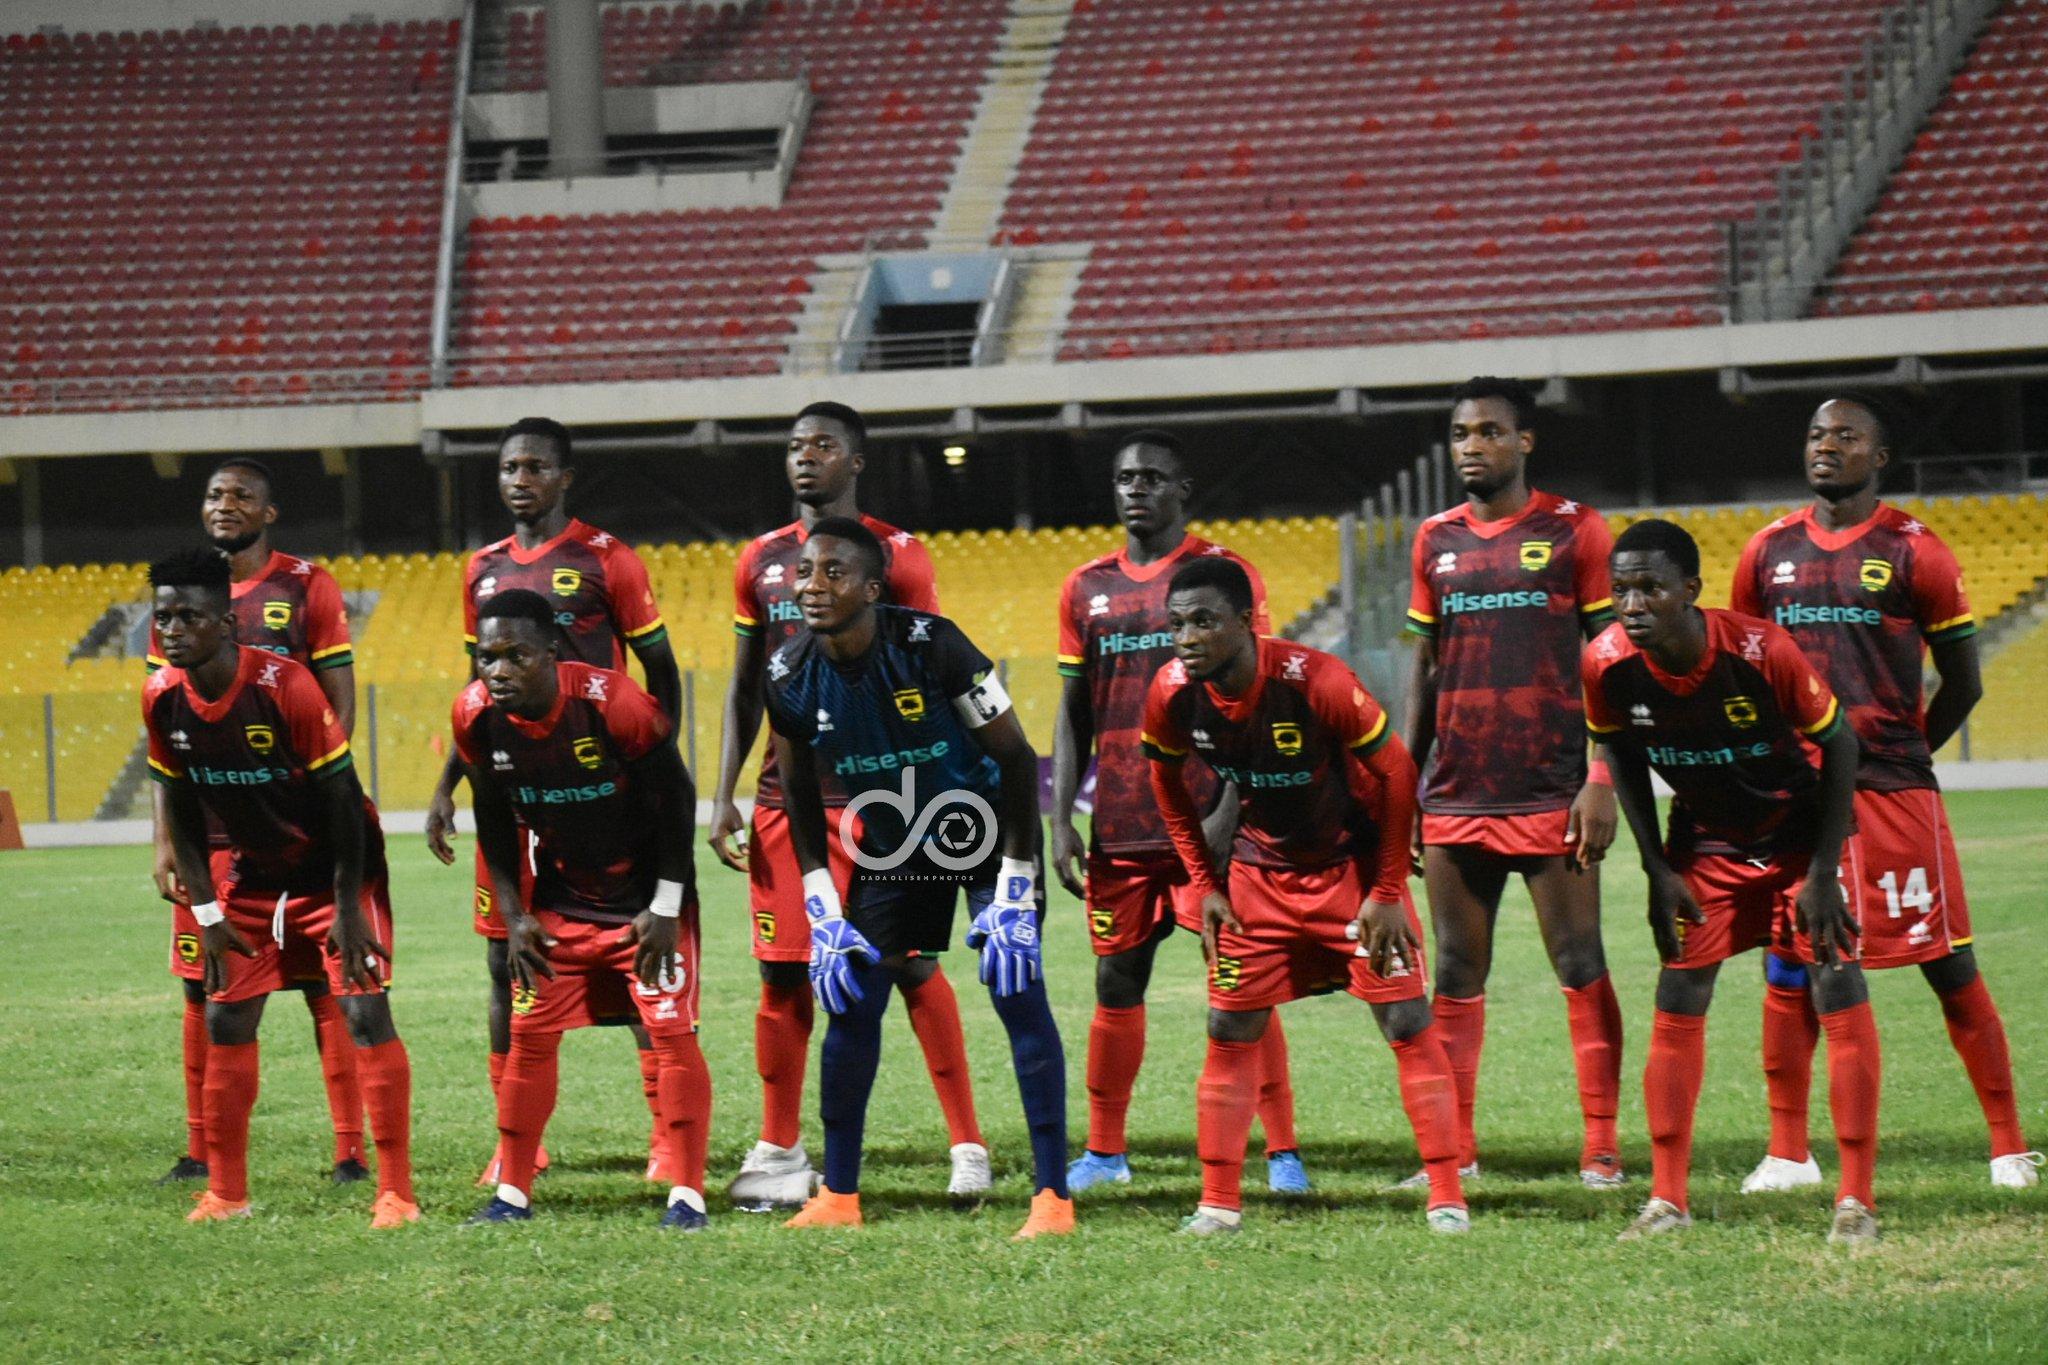 Kotoko coach Johnson Smith names starting lineup for tough Aduana Stars clash